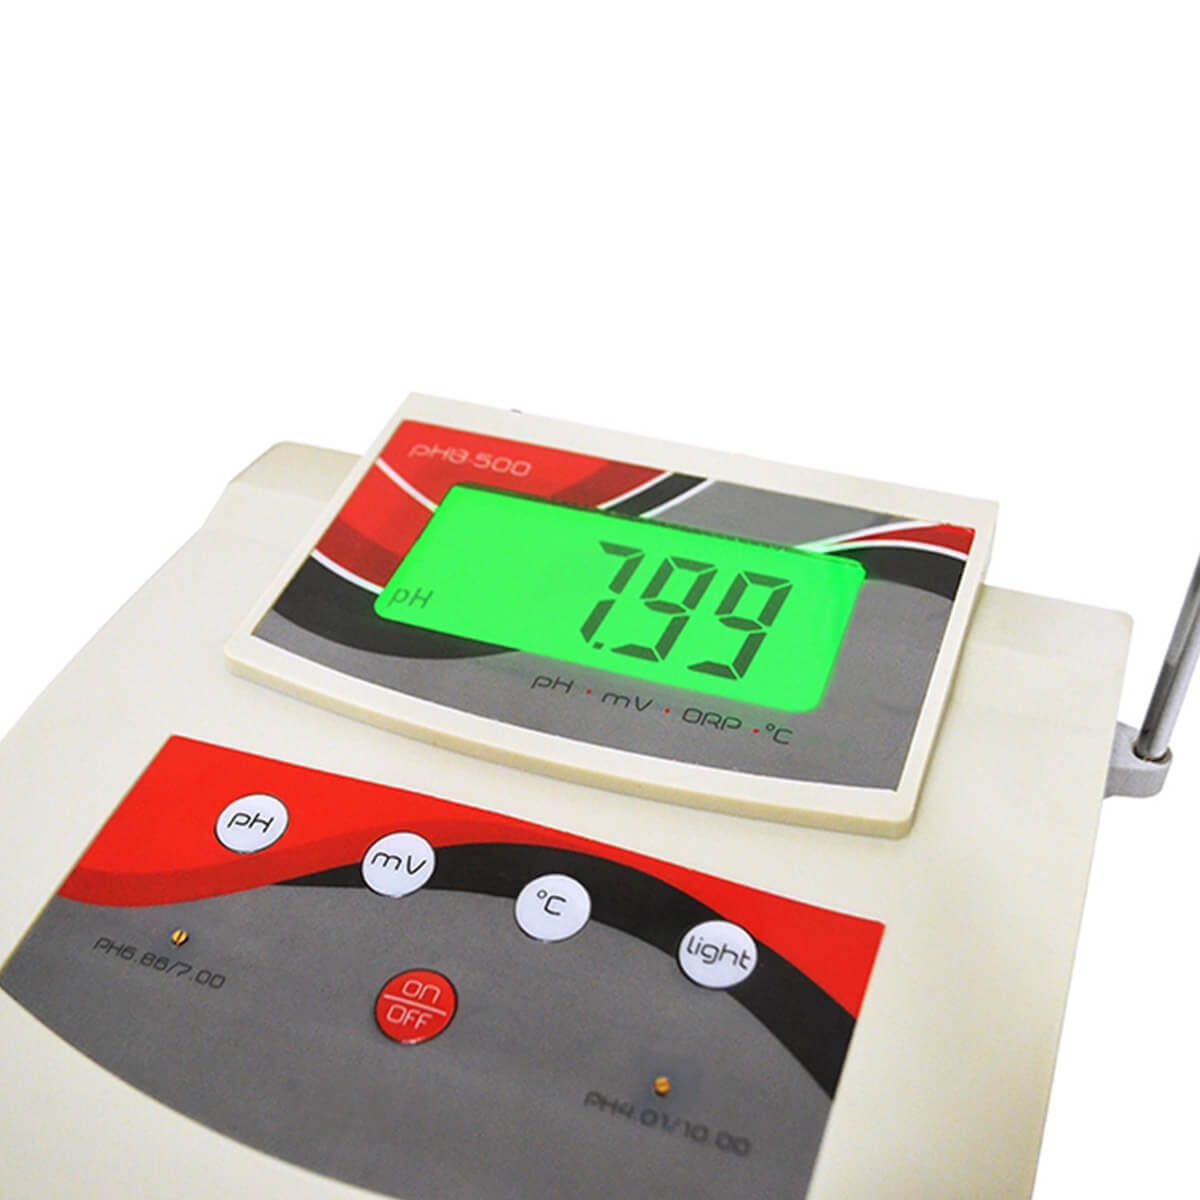 Phmetro de Bancada Ph, Mv (orp) E Temperatura